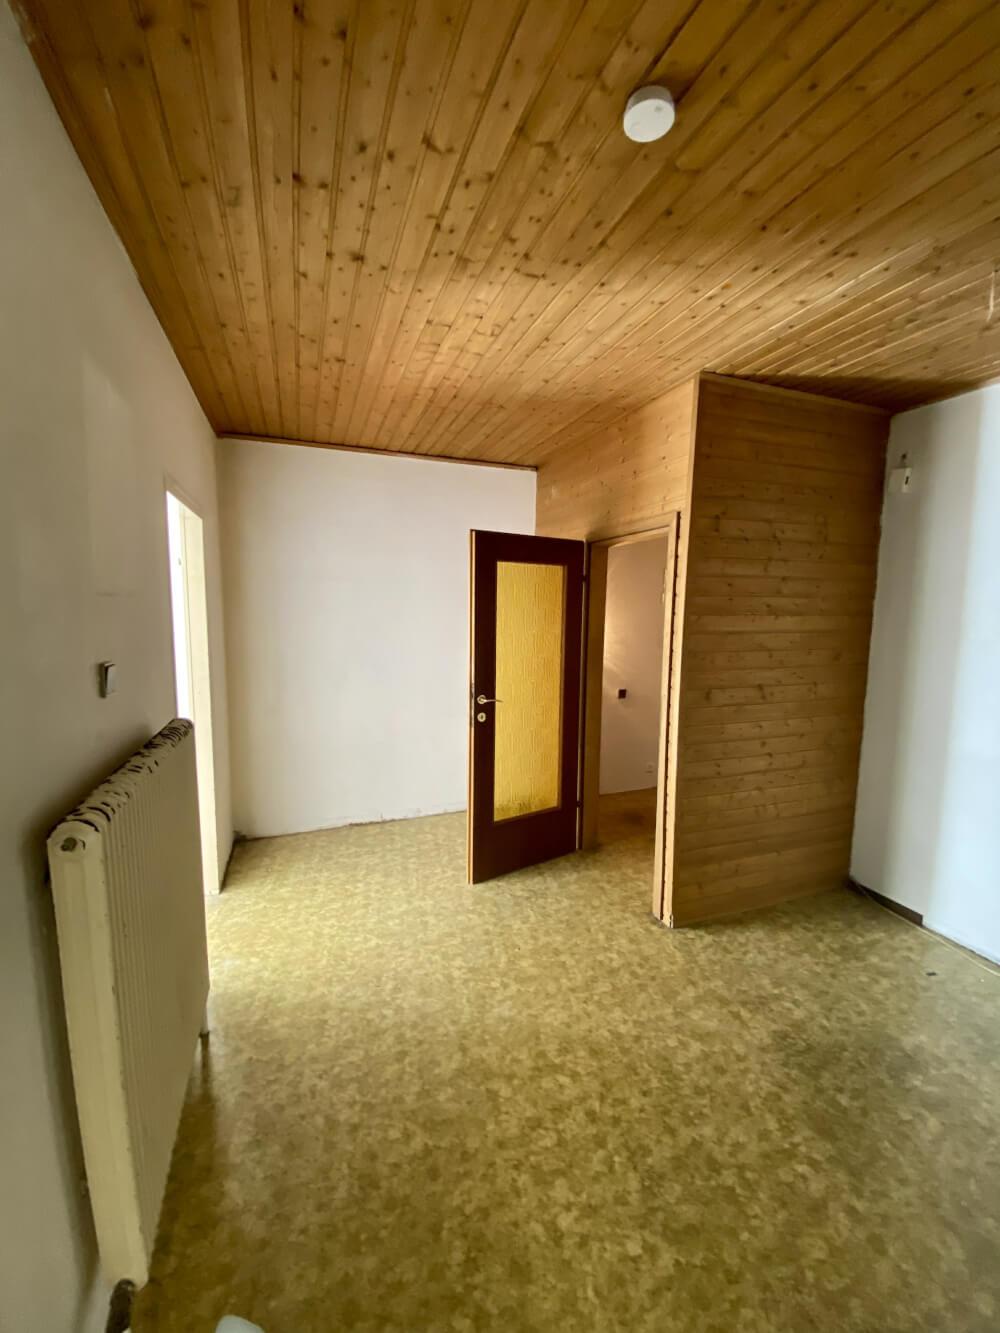 Immobilie von BWSG in Laudongasse 22a/27, 8020 Graz #6